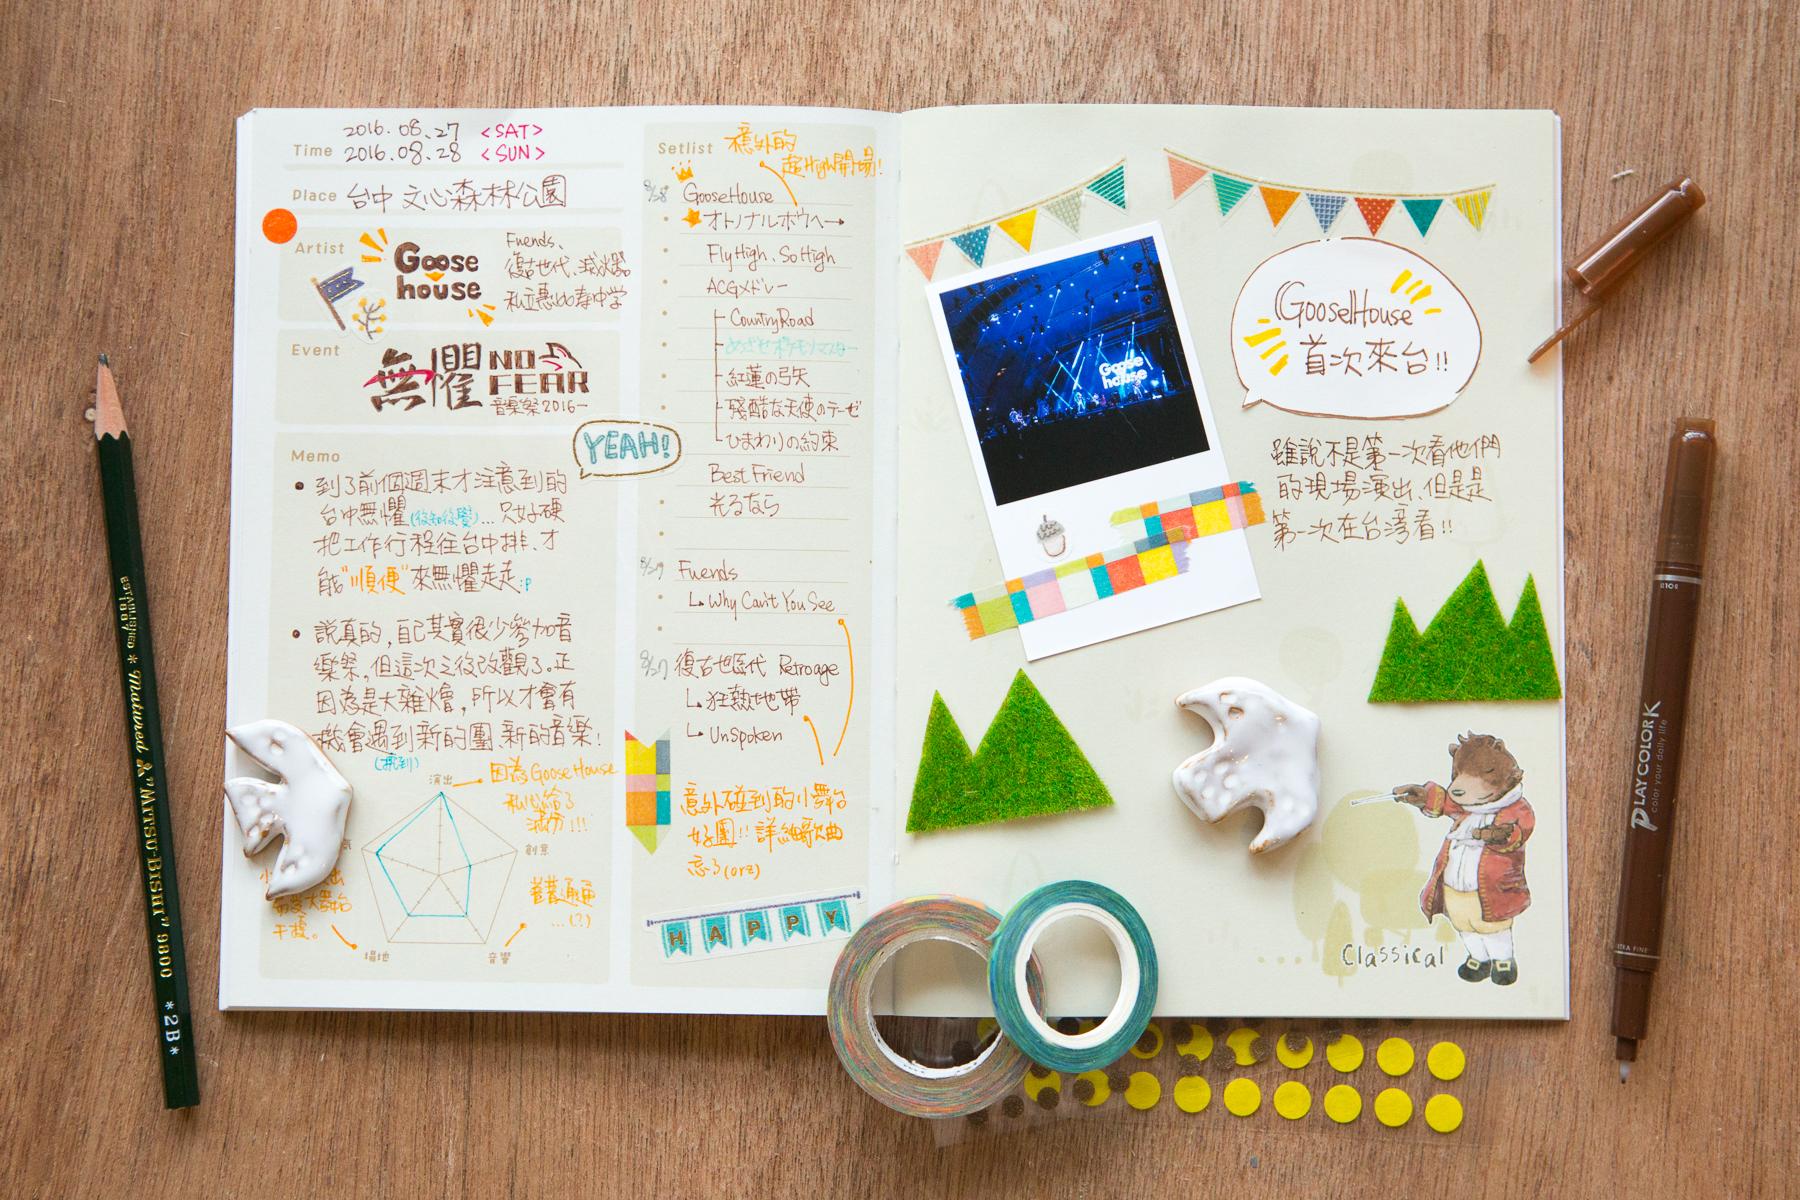 Make Some Music 輕巧周年曆 - Live Music Note